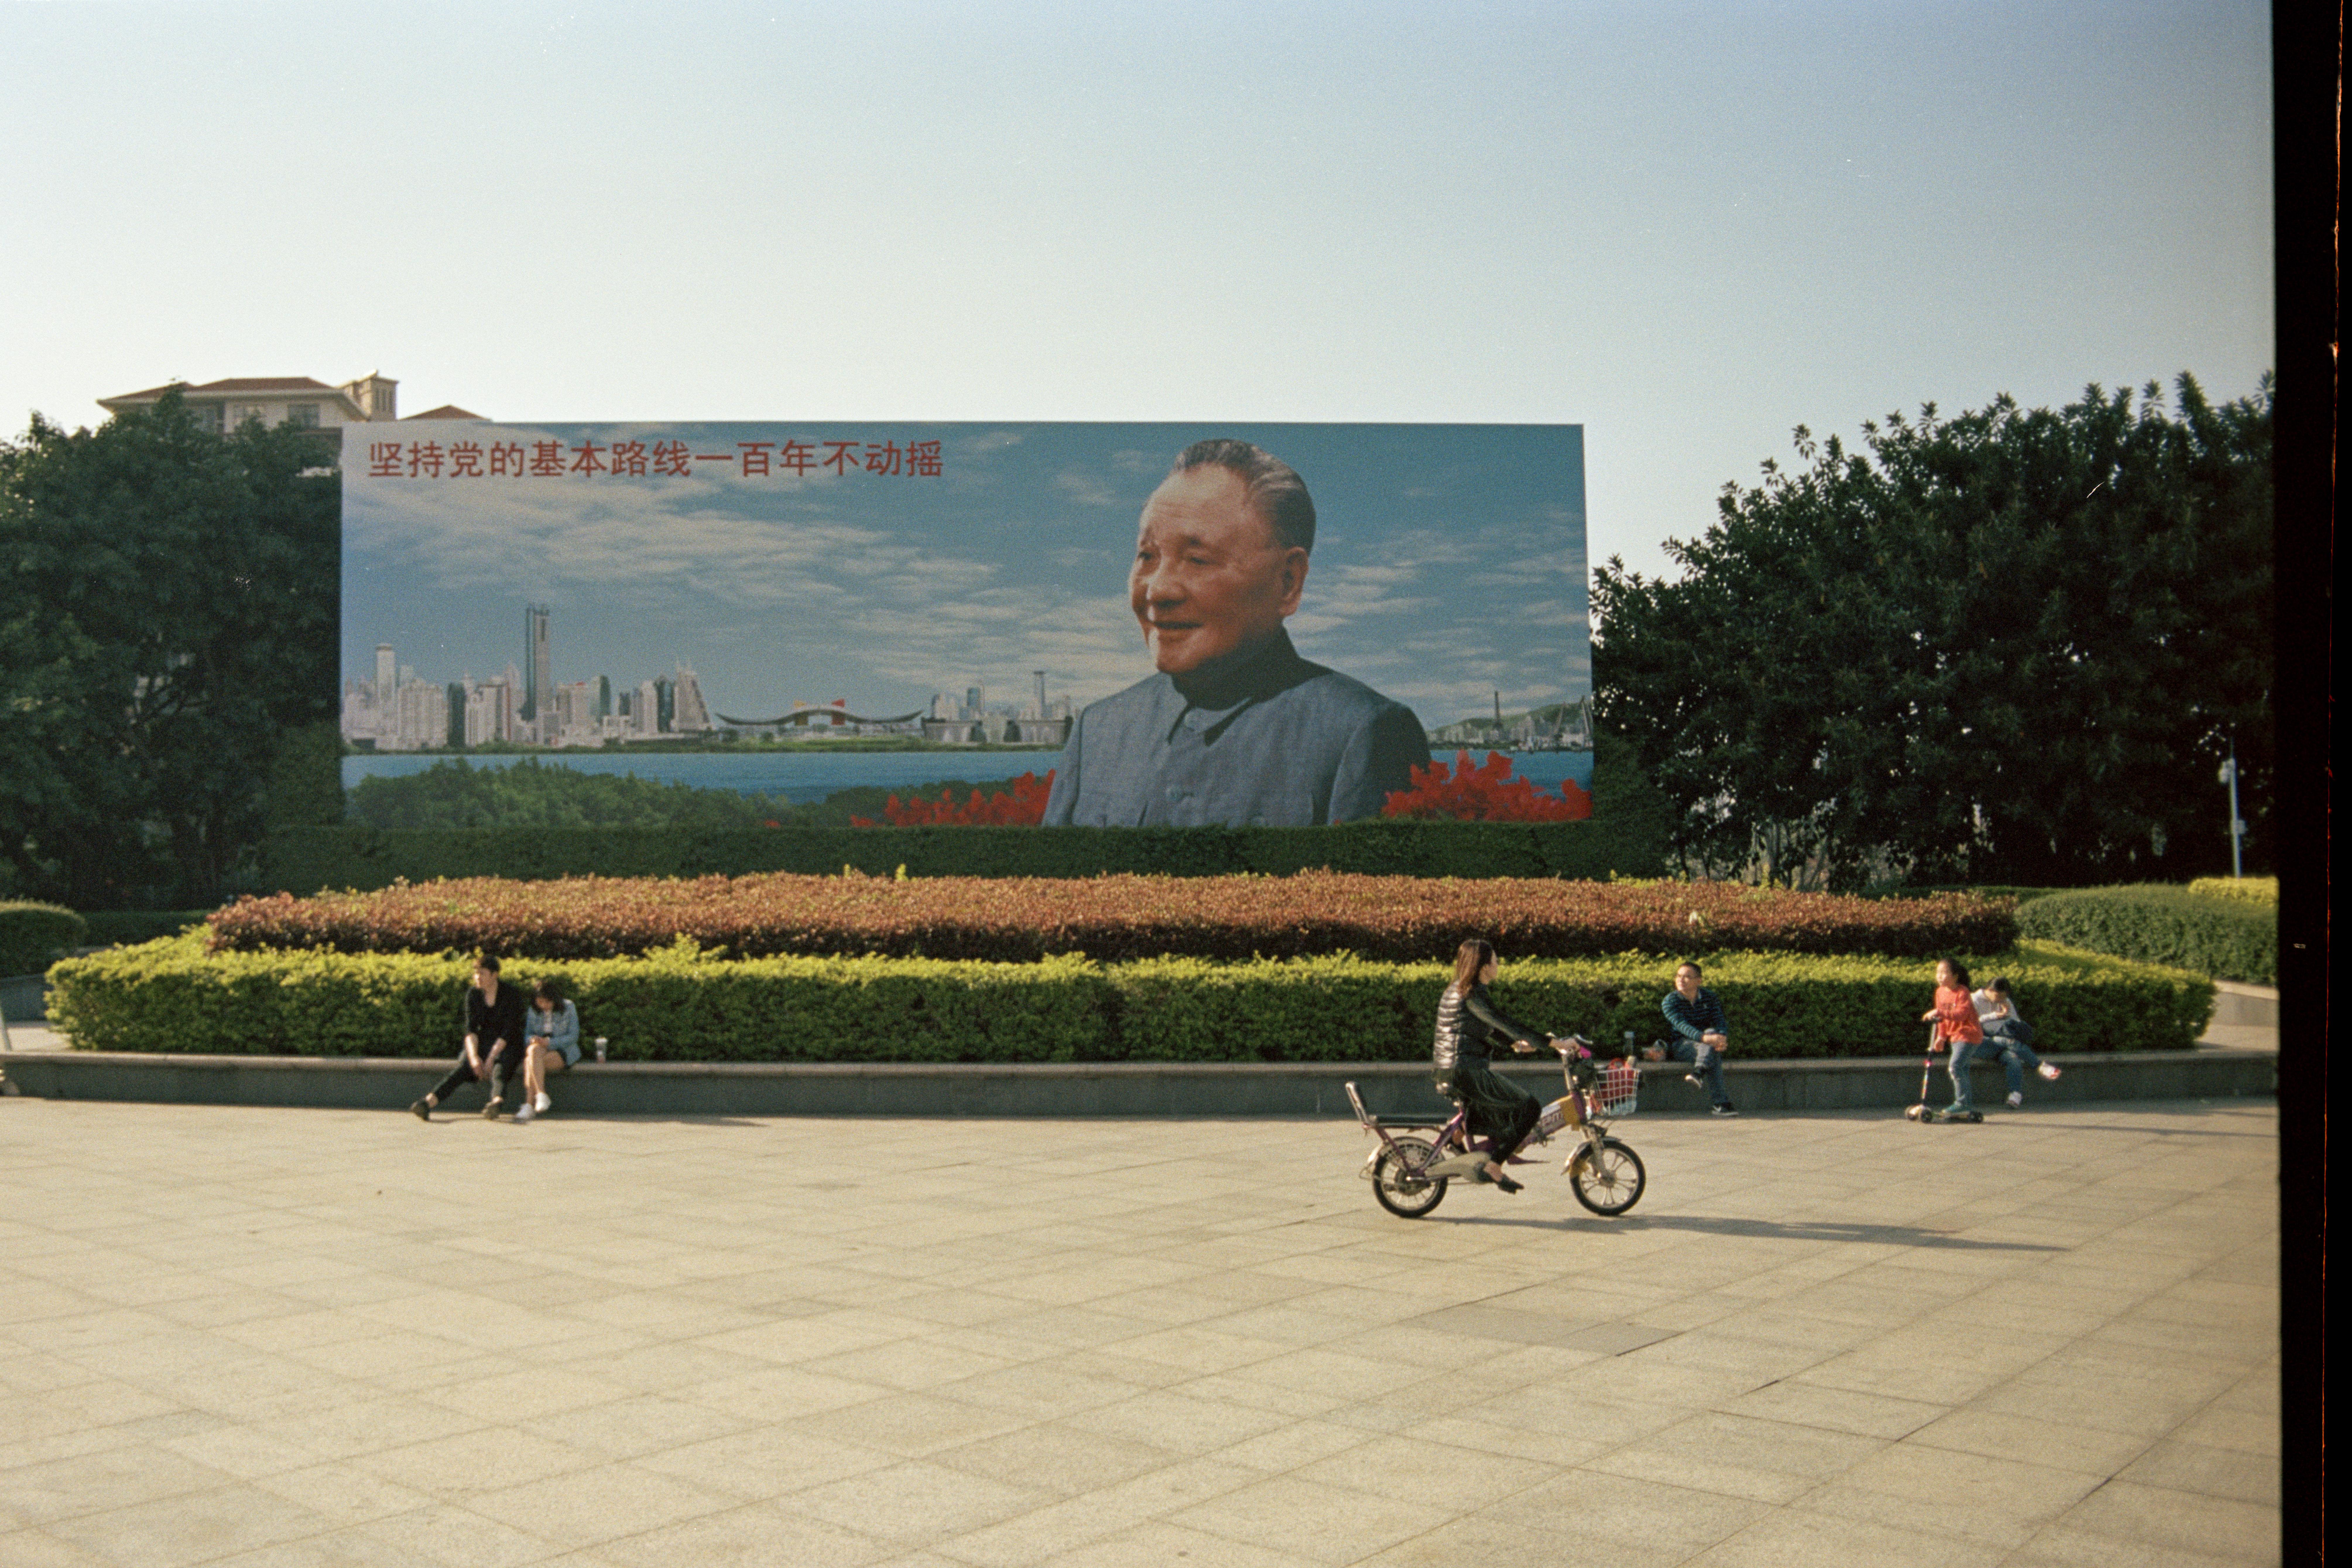 Xi Jinping Billboard